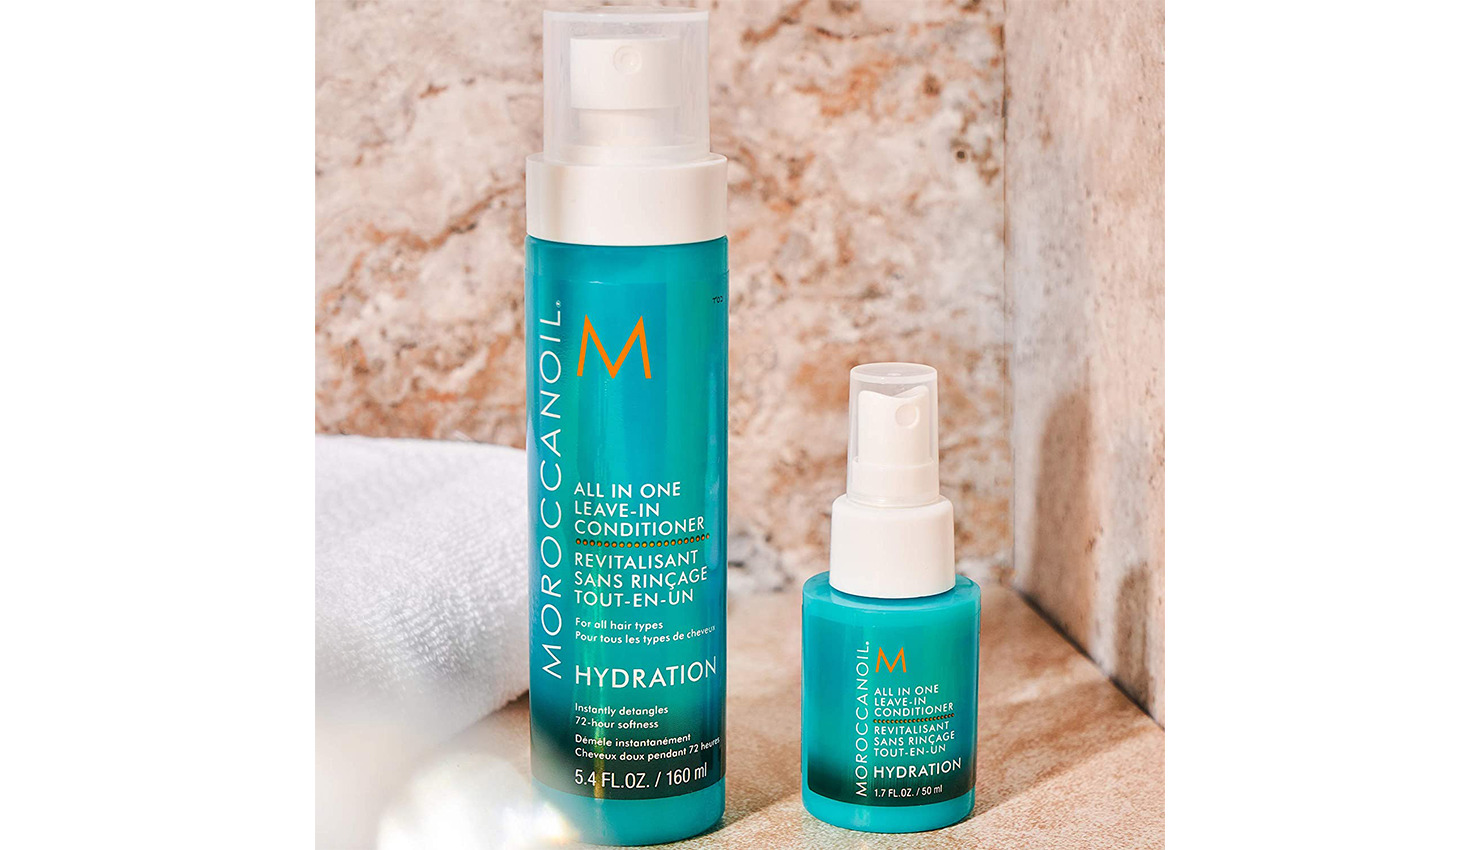 moroccanoil-productos-cabello-verano-magazinehorse2